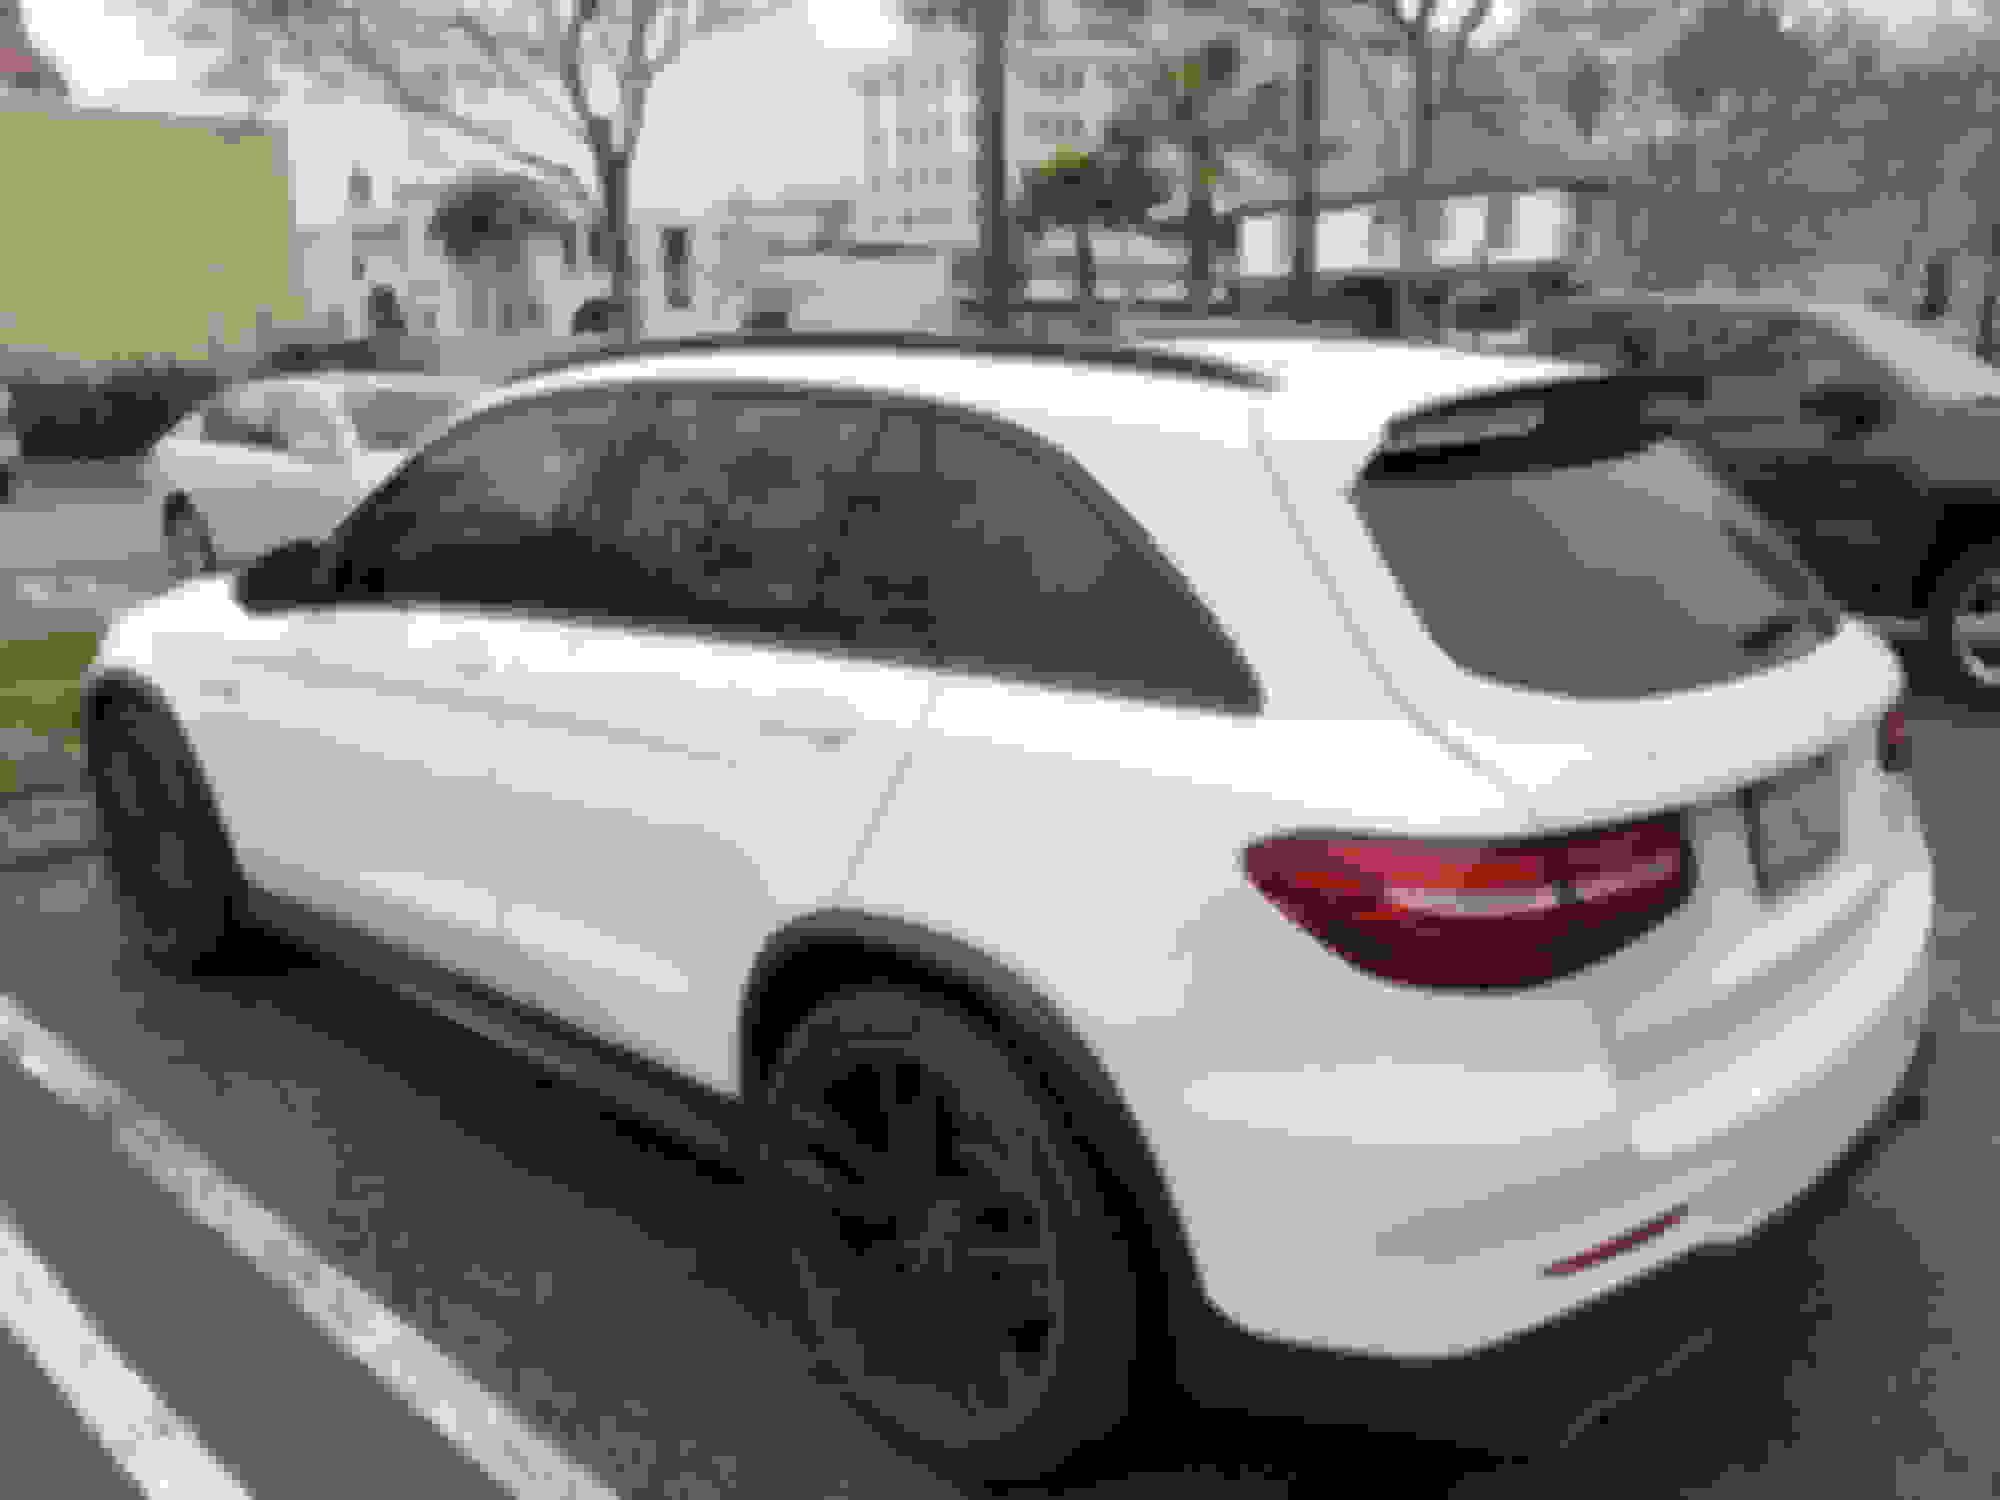 For Mercedes-Benz ML63 AMG 07-10 Spoiler Factory Style Fiberglass Rear Roofline